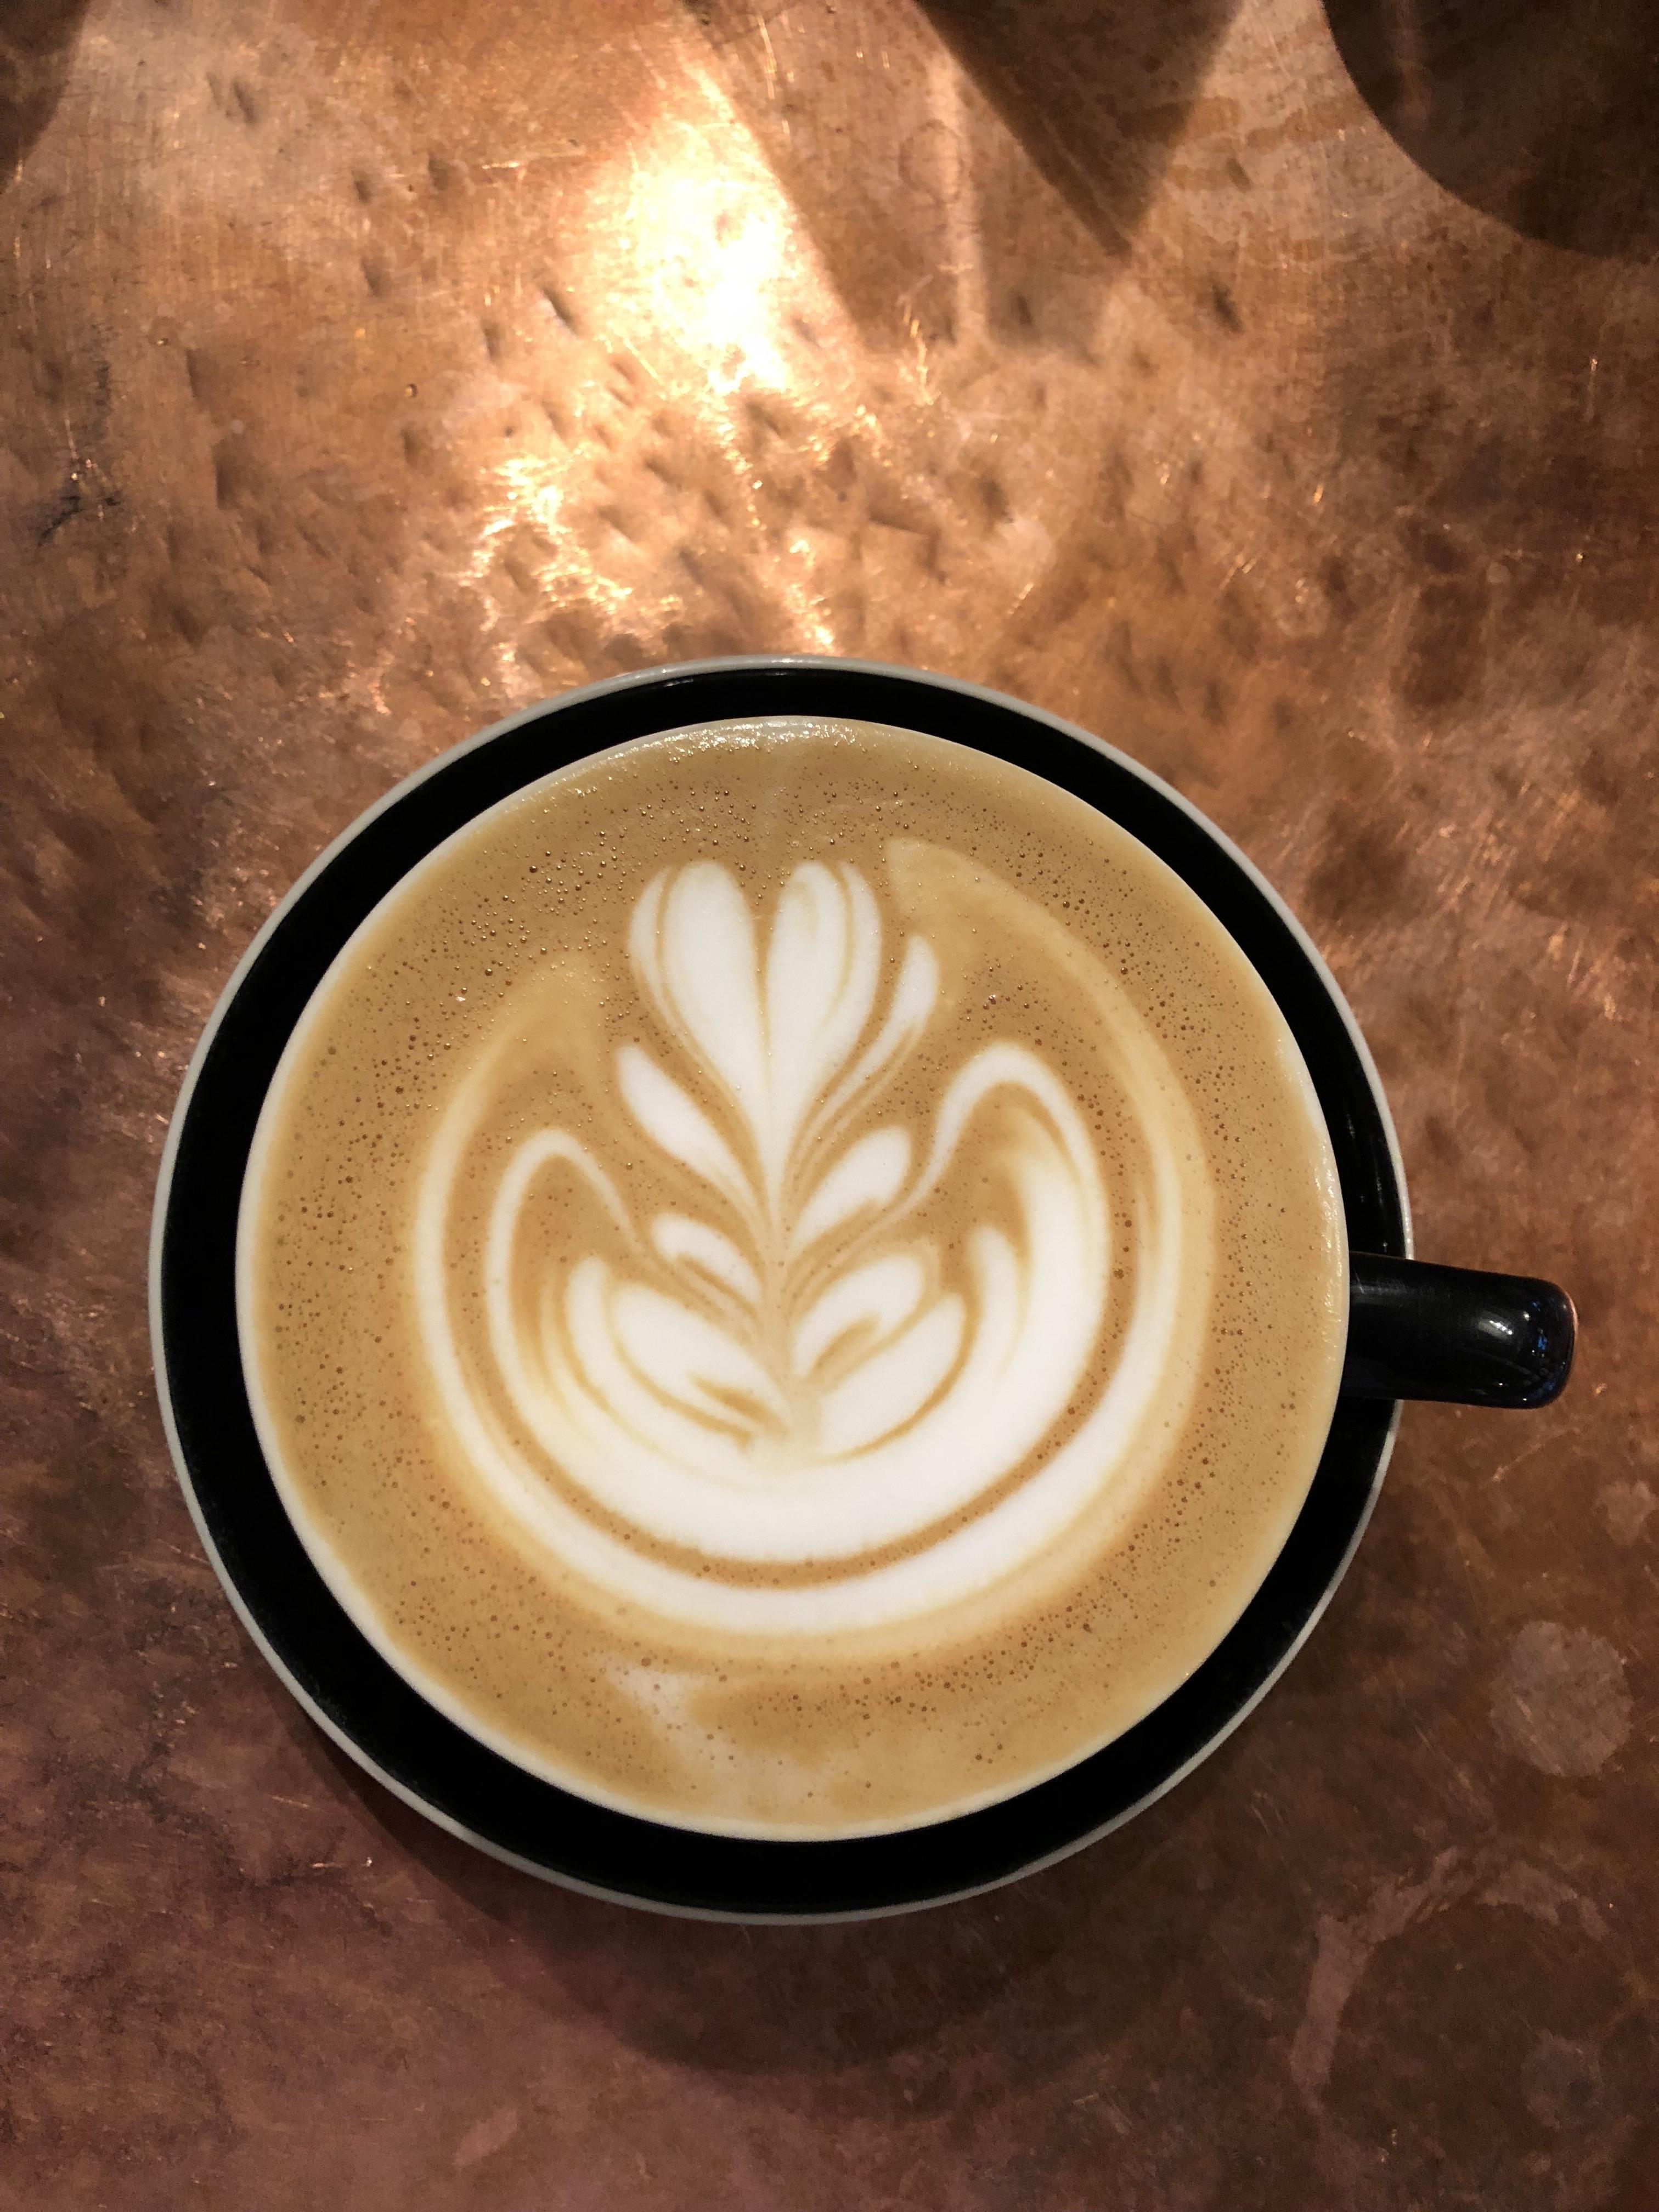 Rainy Day Capp Coffee Cafe Espresso Photography Coffeeaddict Yummy Barista In 2020 Best Espresso Machine Best Coffee Grinder Best Espresso